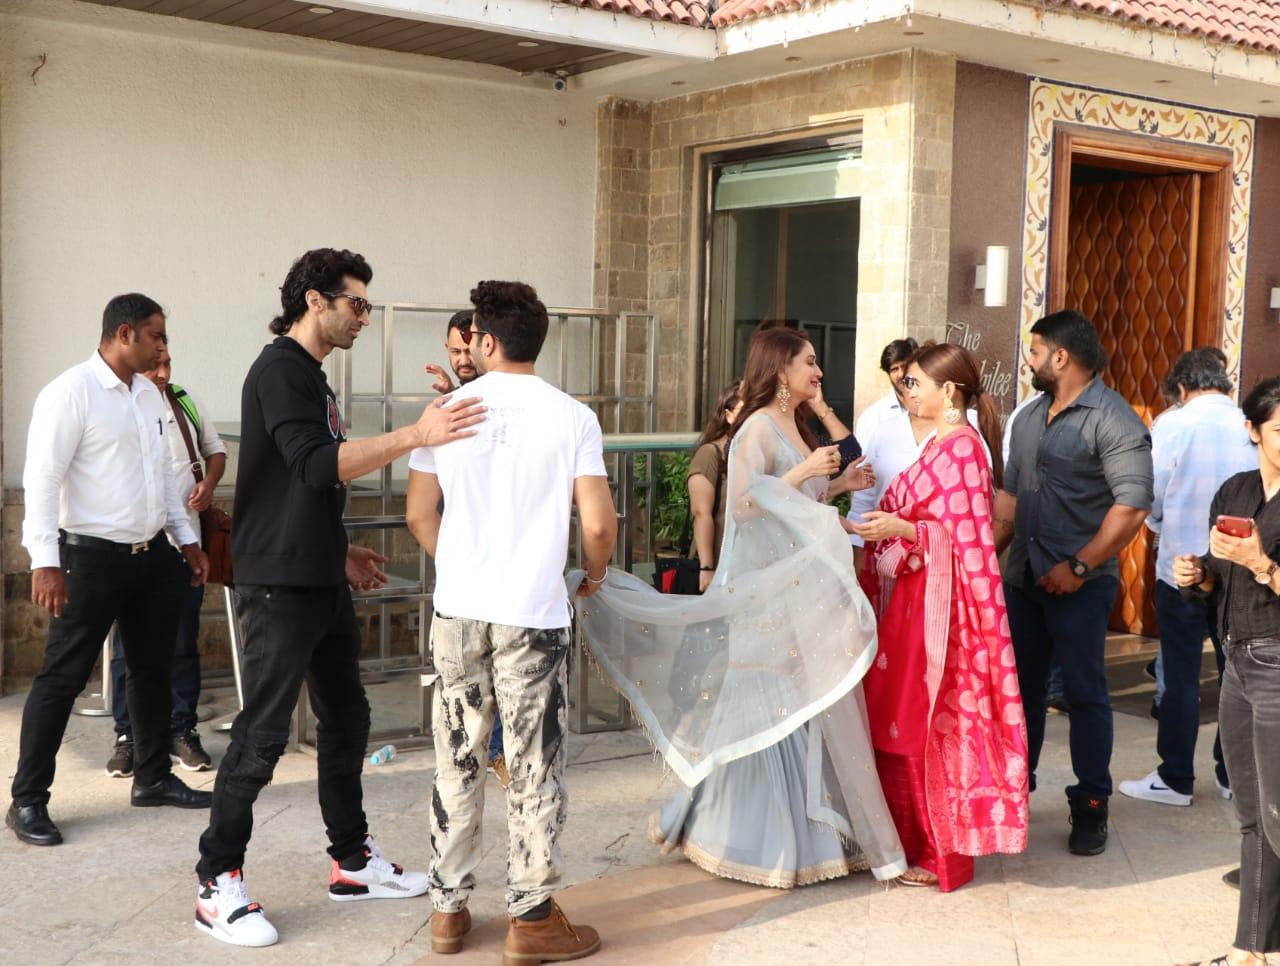 Kalank Varun Dhawan Alia bhatt ADitya Roy Kapoor Fun